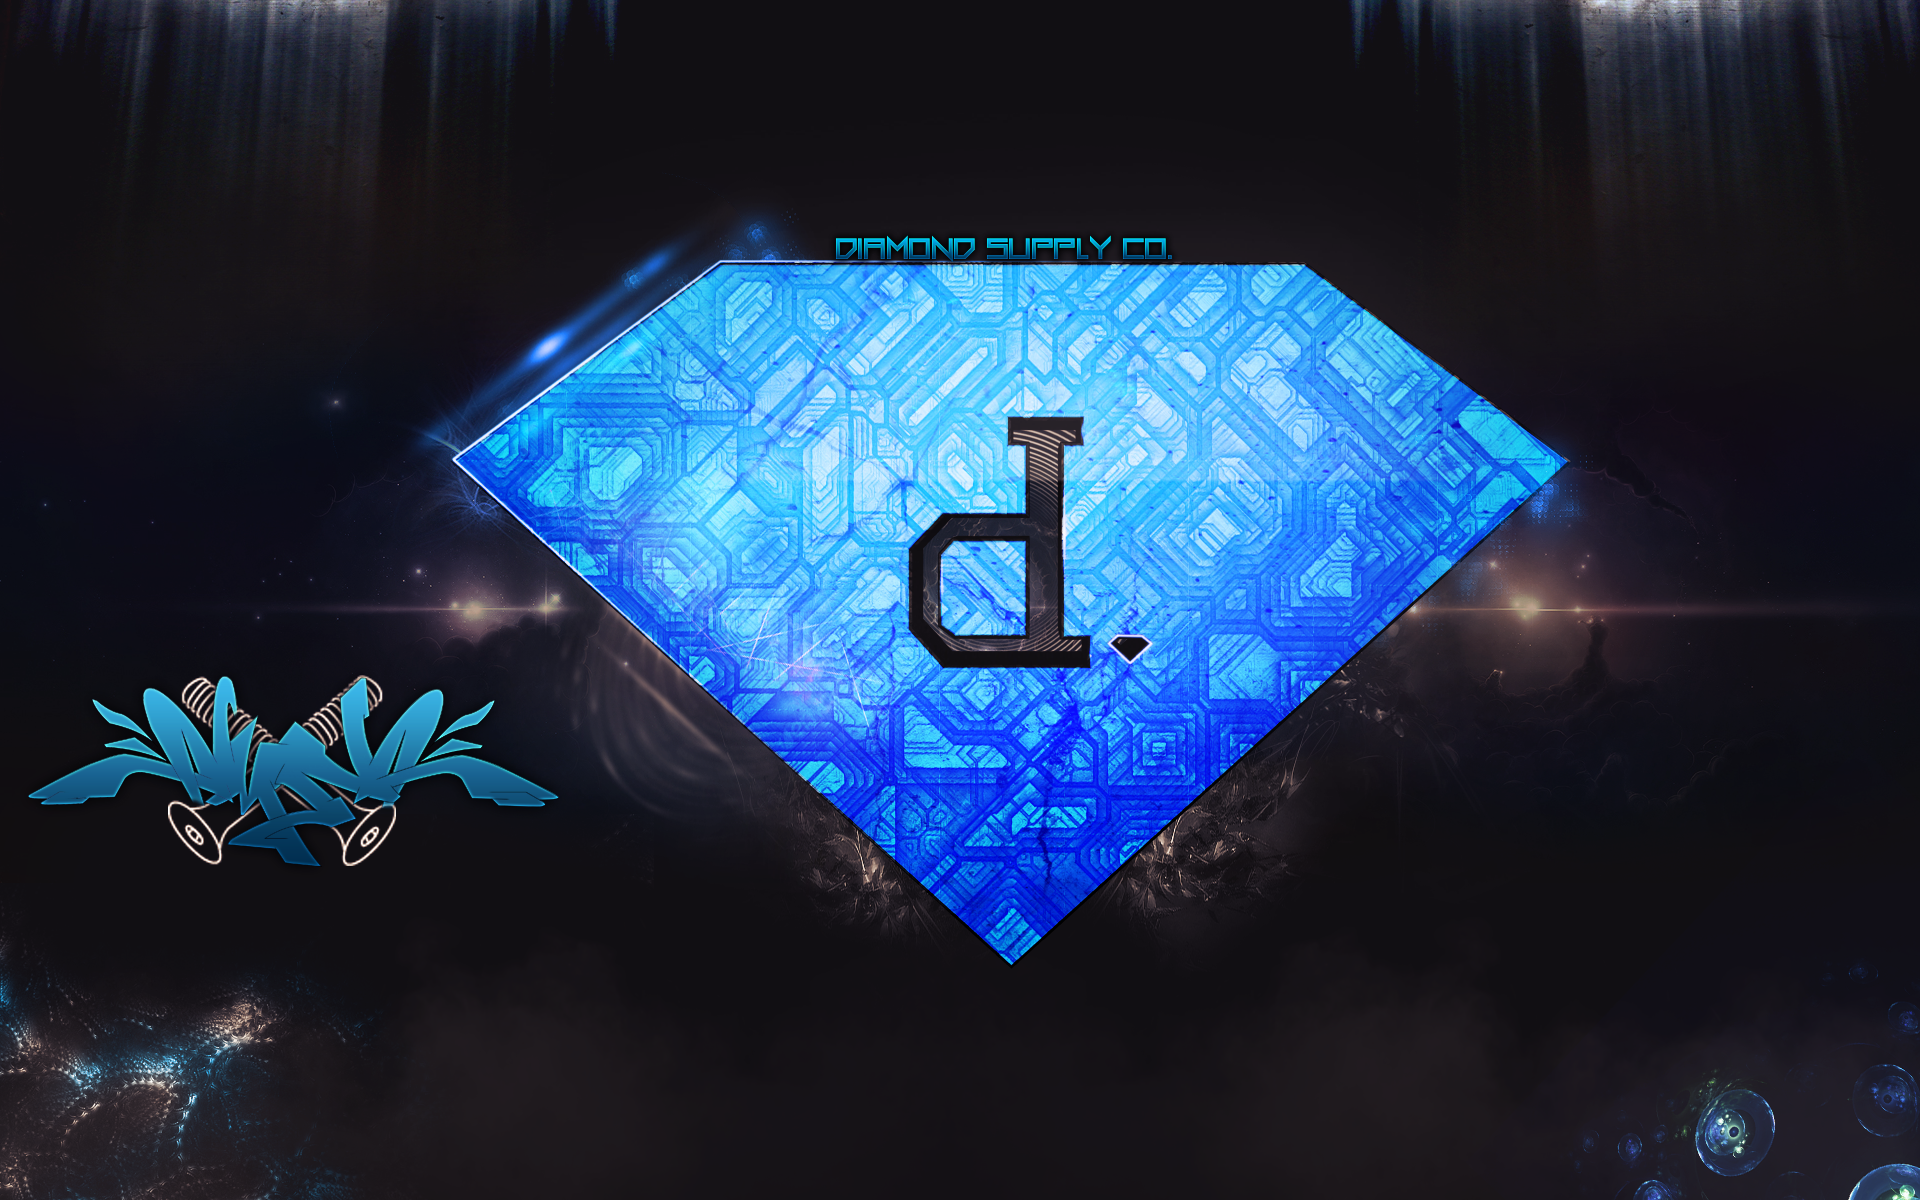 Download Diamond Supply Flowdesiigns Fan Art Other Wallpaper